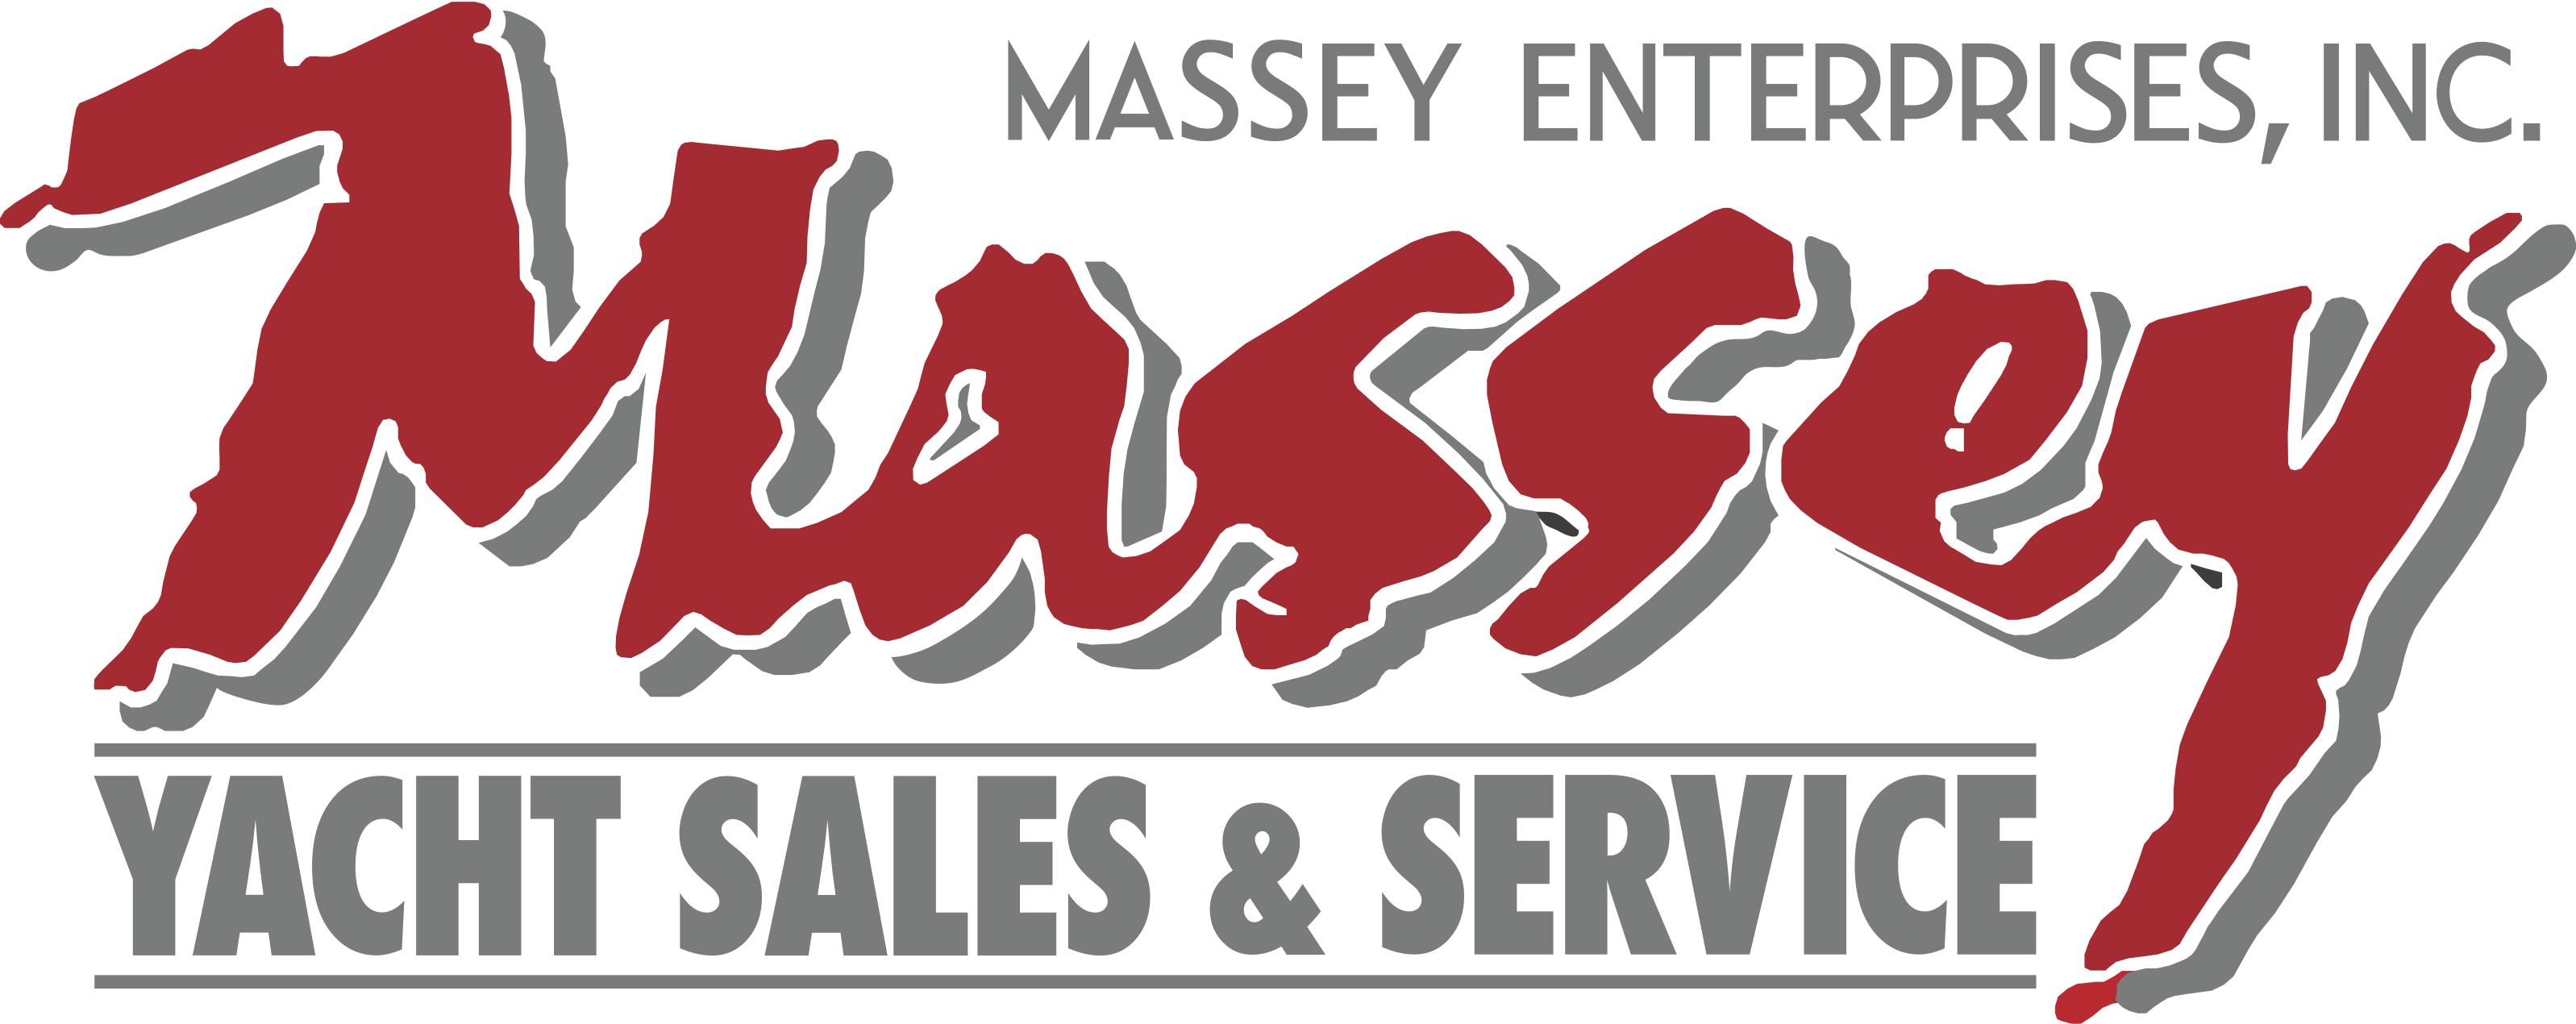 MASSEY YACHT SALES & SERVICE PALMETTO